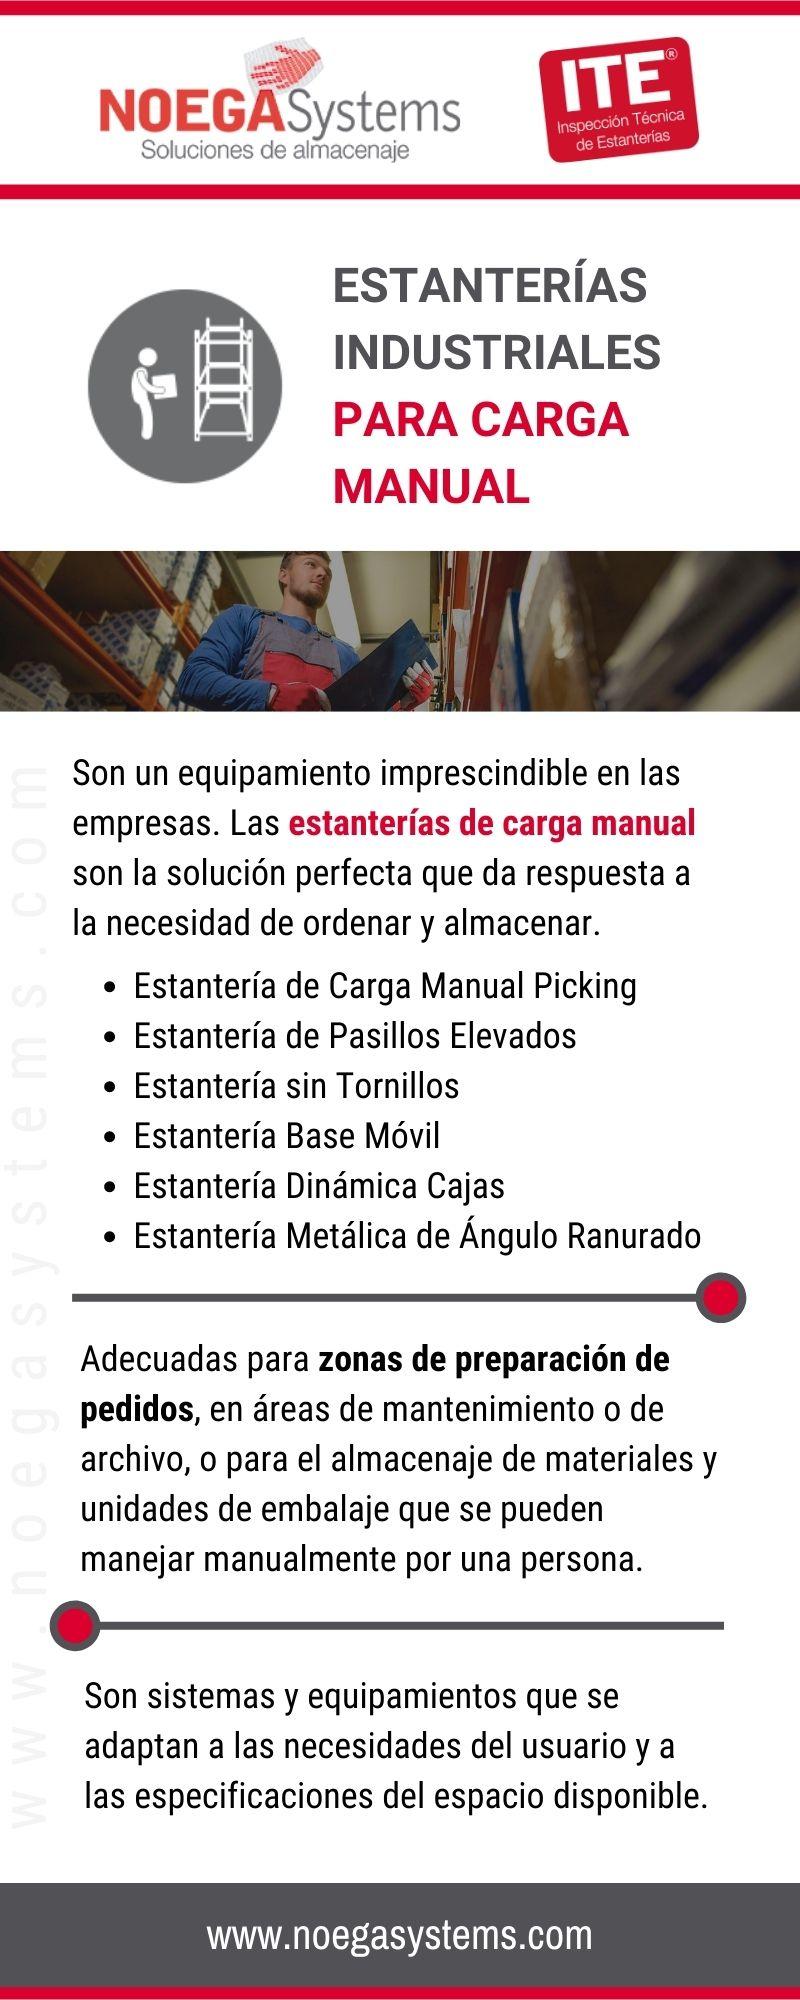 Infografía Estanterías Industriales para carga manual